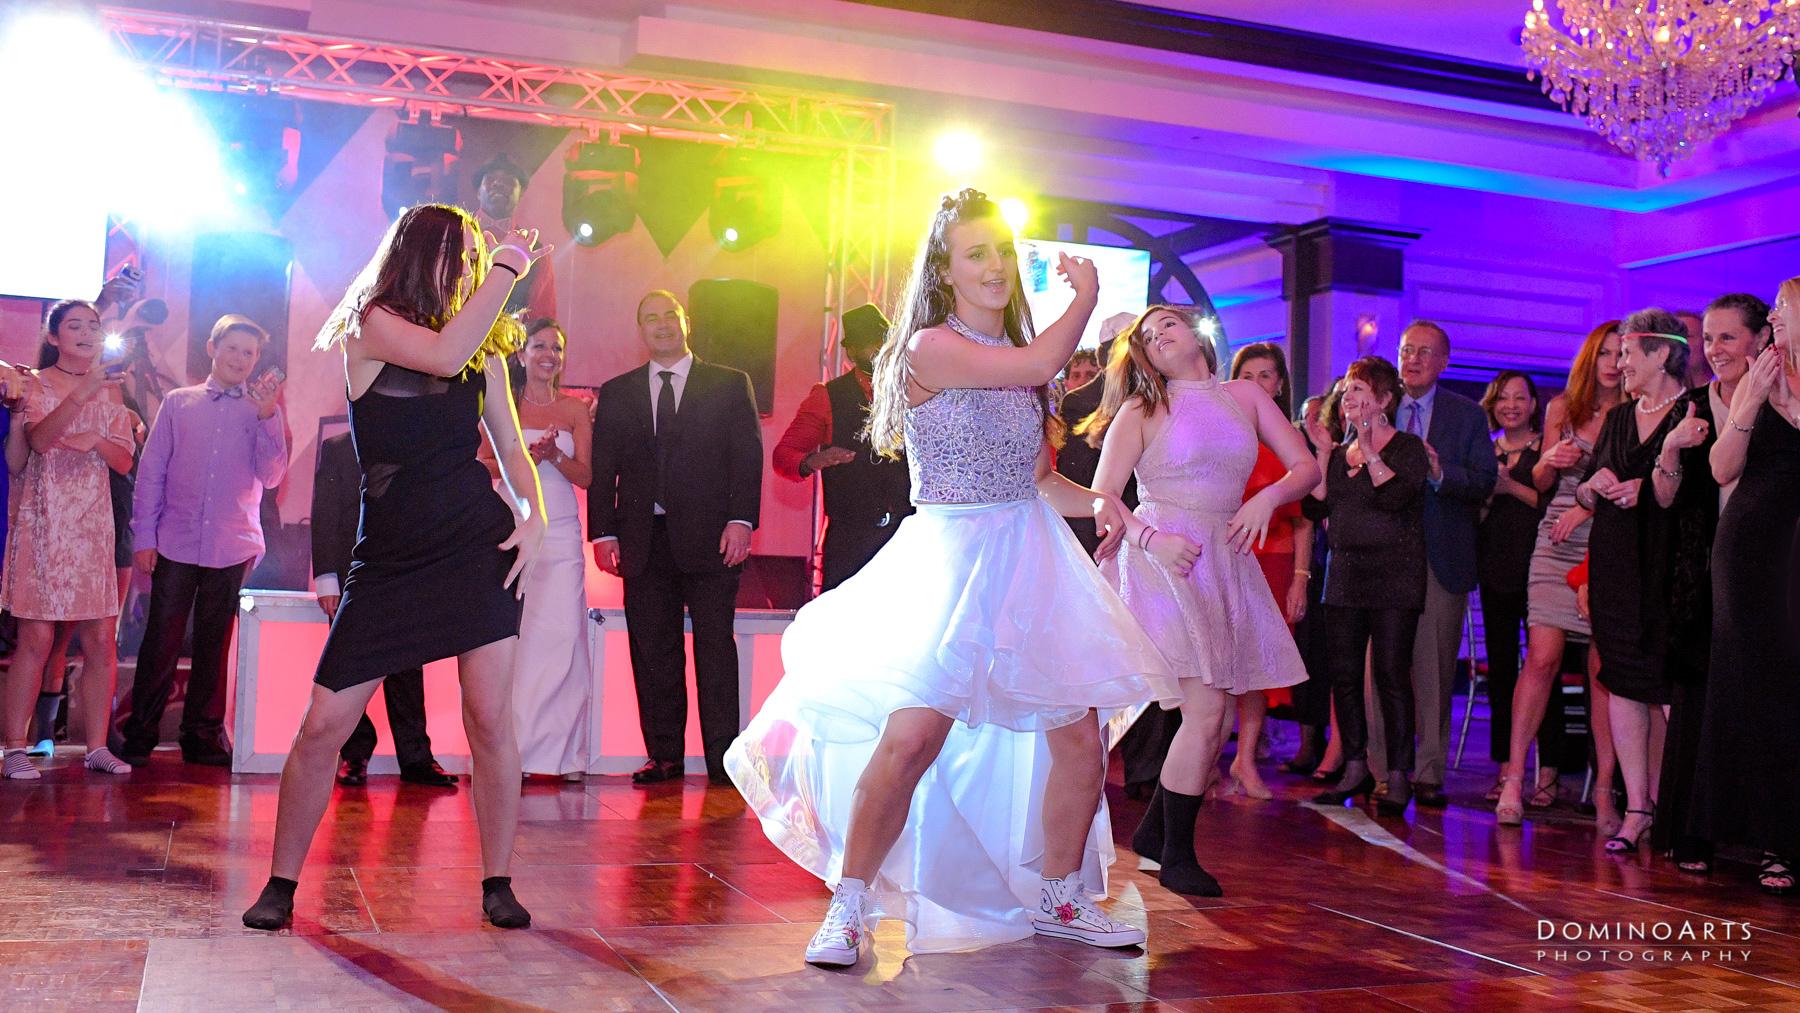 Fun dancing party pictures at Temple Beth El Mitzvah, Boca Raton